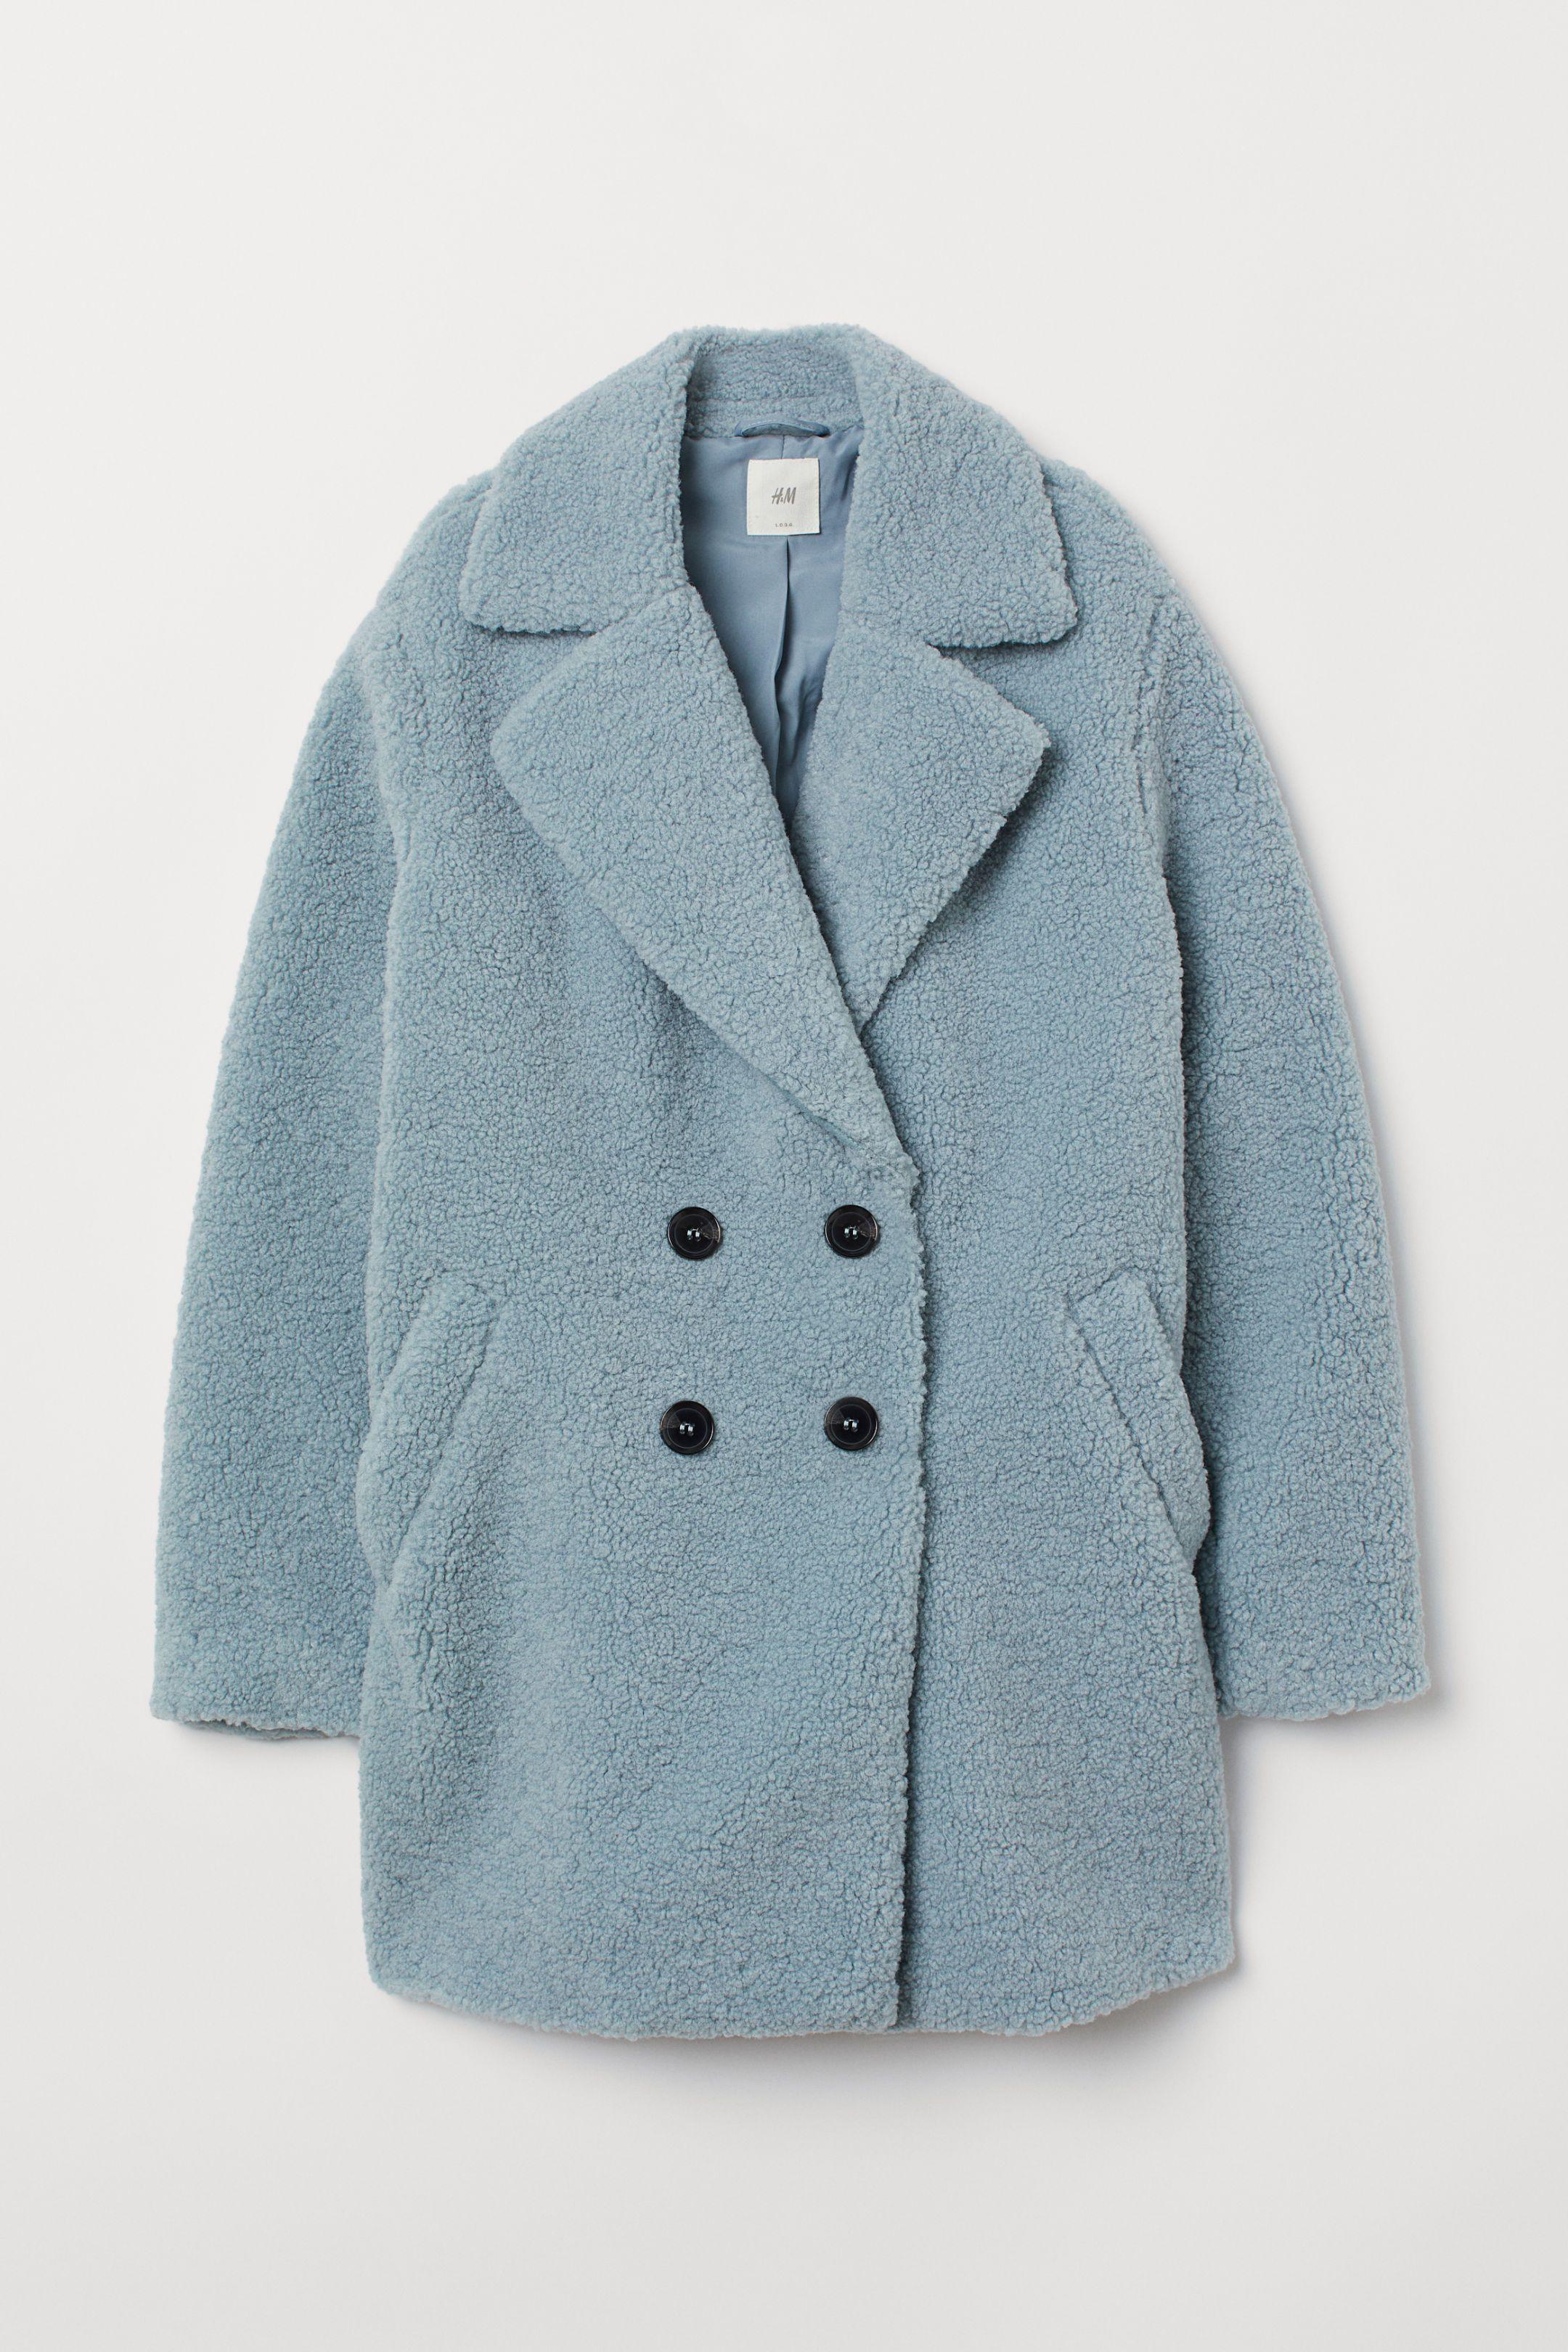 Lichtblauwe Winterjas Dames.Teddy Jas Things I Like Jas Lichtblauw En Kragen